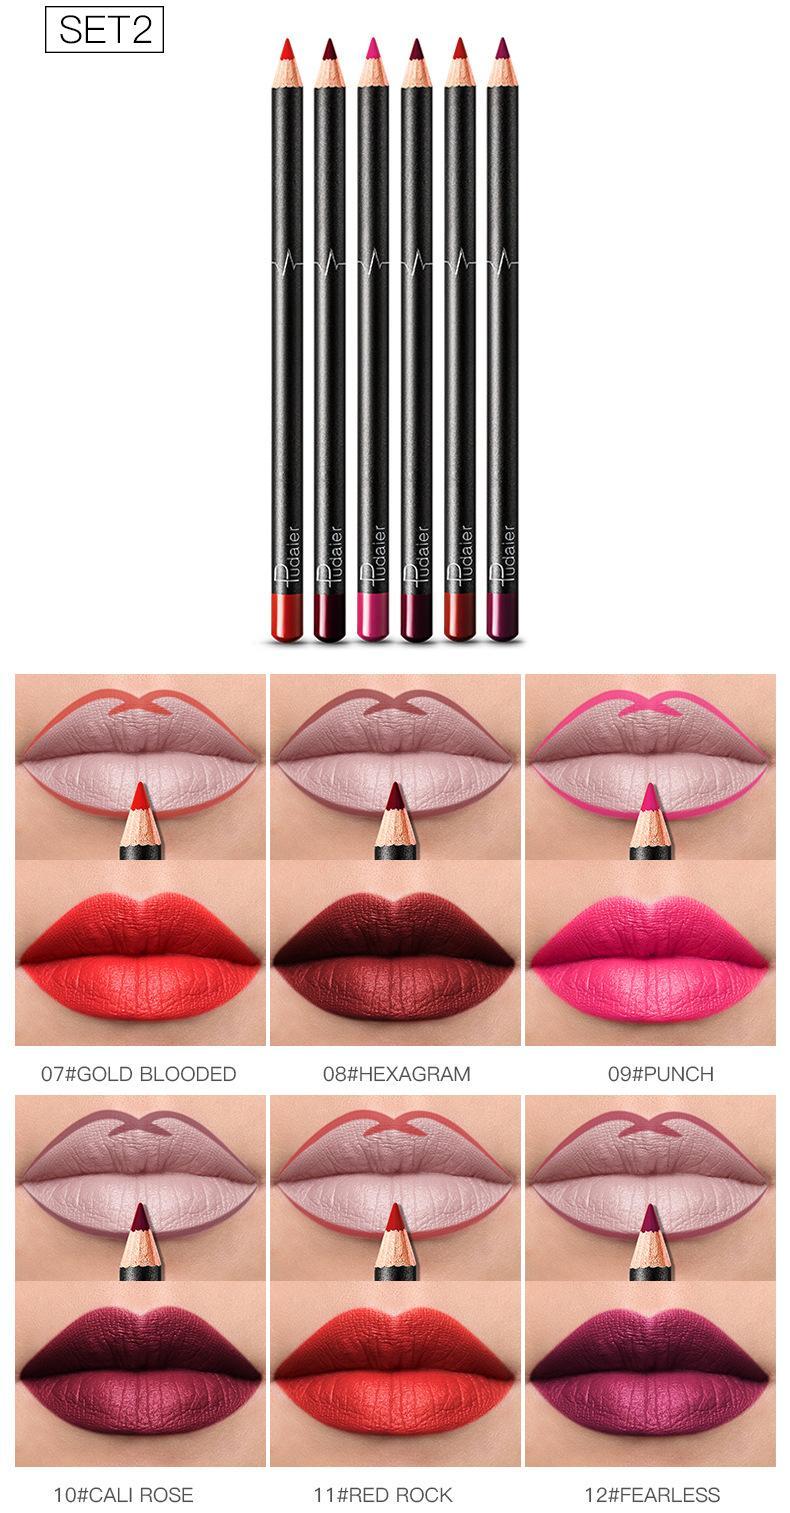 36 Colores Lápiz de labios Matte Lipstick Set Impermeable Largo Duradero Matt Nude Línea Labial Natural Hidratación Ingredientes Esquema Labios Labios